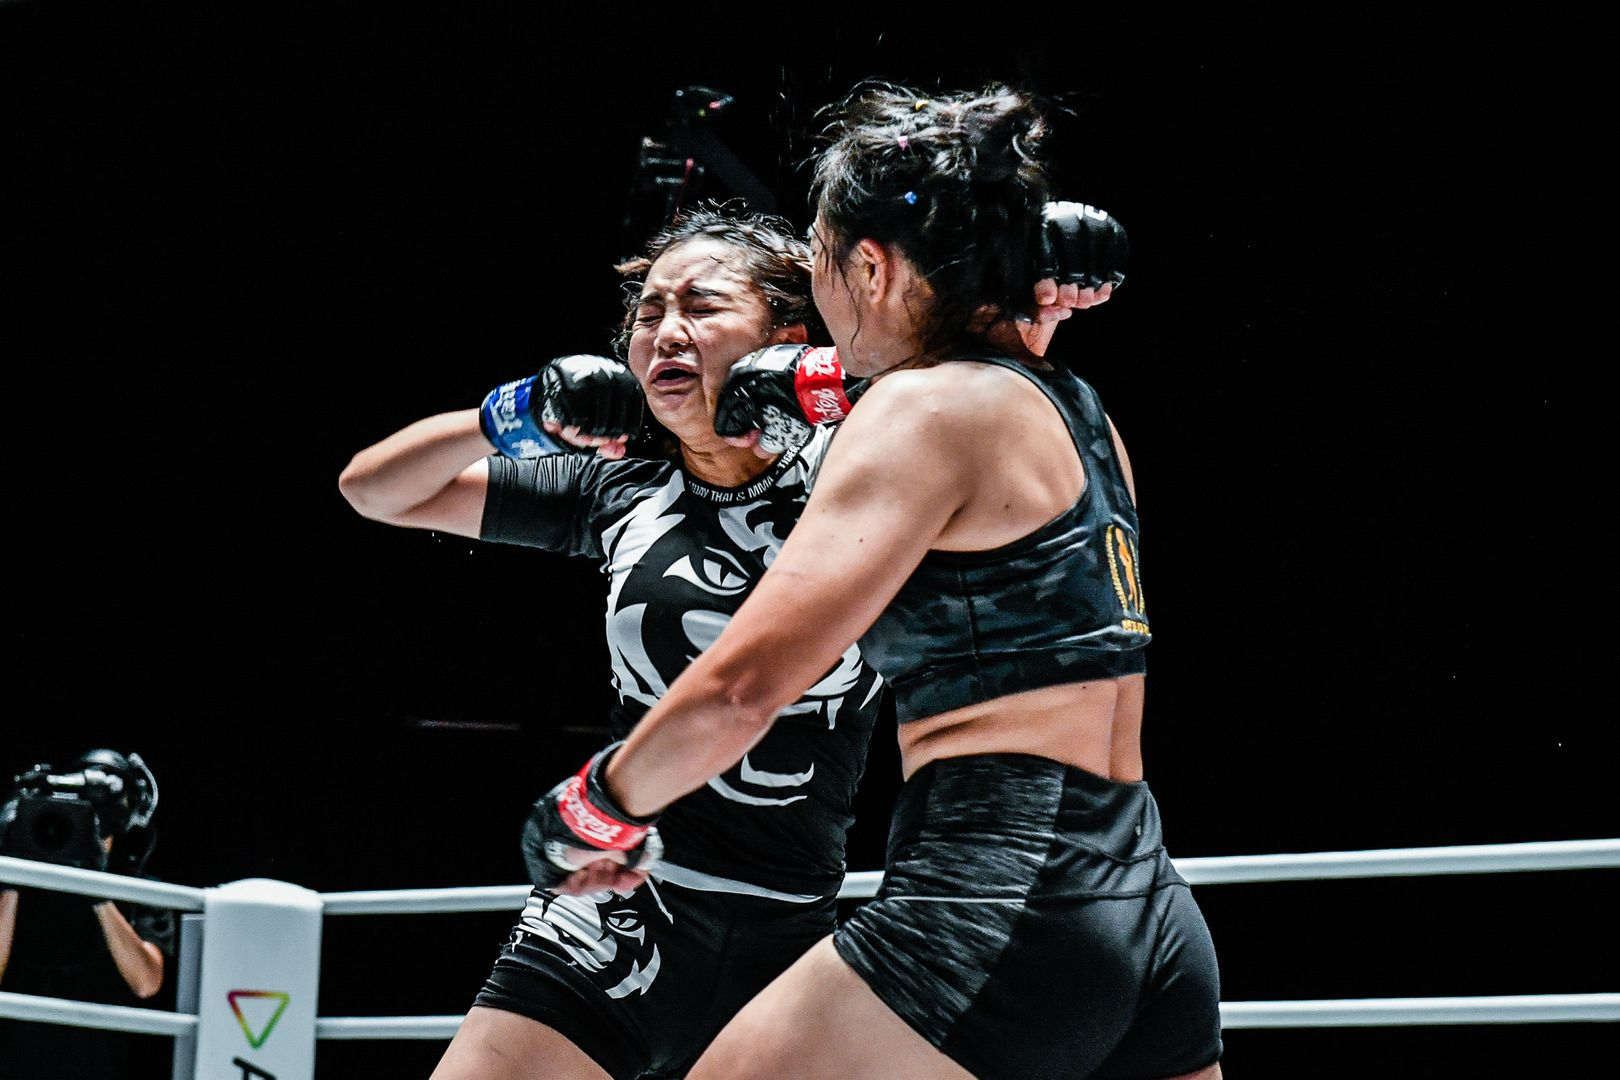 Thai mixed martial artists Sunisa Srisen and Rika Ishige do battle